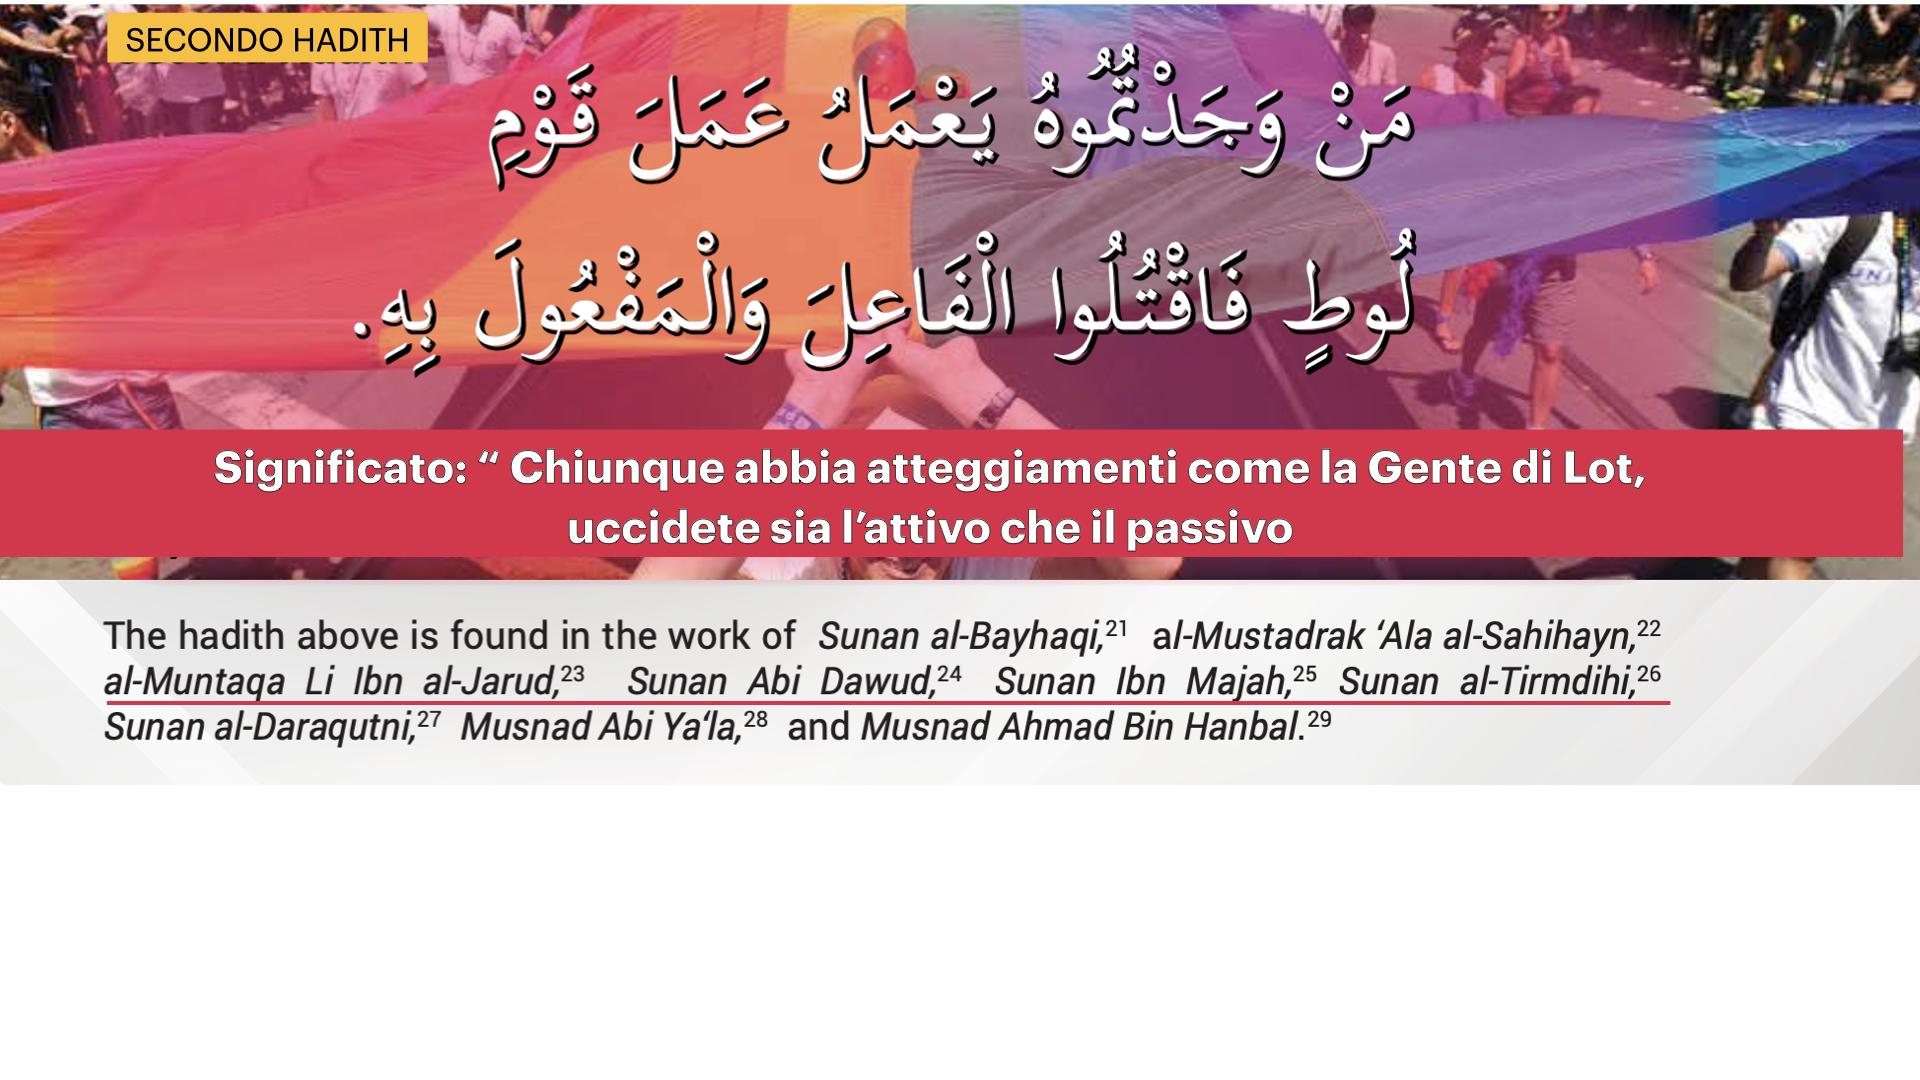 L'hadith di cui sopra si trova nel lavoro di Sunan al-Bayhaqi,21 al-Mustadrak 'Ala al-Sahihayn,22 al-Muntaqa Li Ibn al-Jarud,23 Sunan Abi Dawud,24 Sunan Ibn Majah,25 Sunan al-Tirmdihi,26 Sunan al-Daraqutni,27 Musnad Abi Ya'la,28 e Musnad Ahmad Bin Hanbal.29